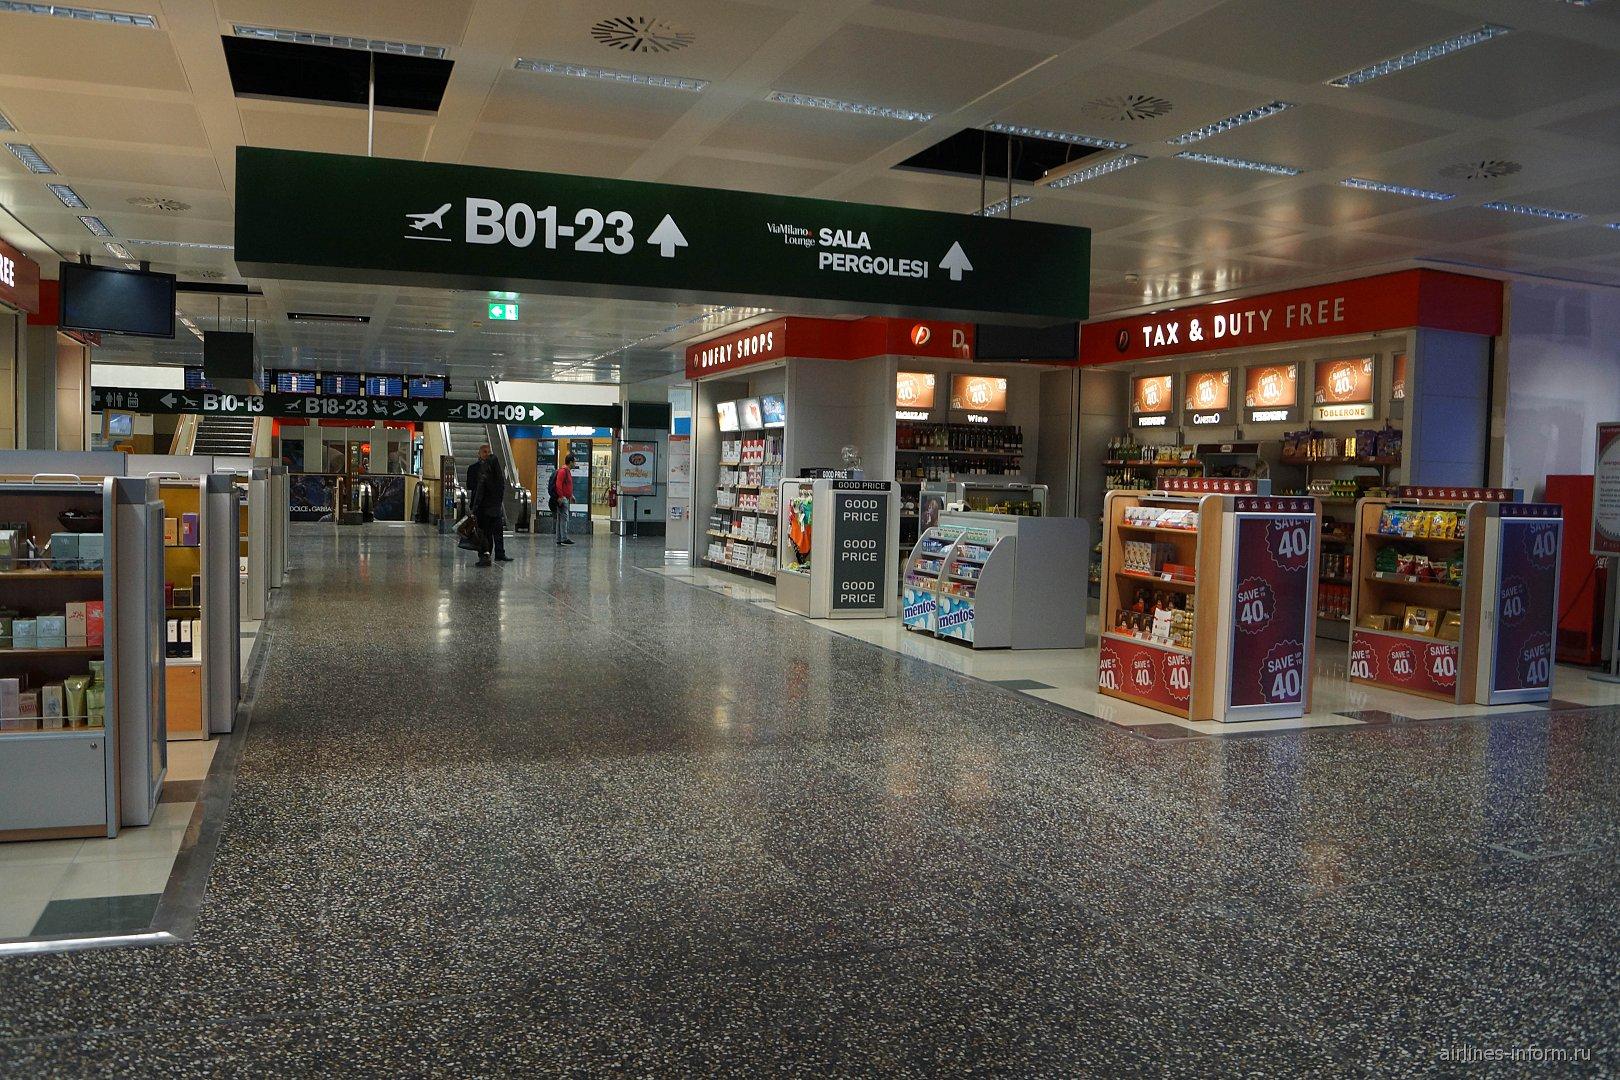 Магазин Duty-Free в секторе B терминала 1 аэропорта Милан Мальпенса